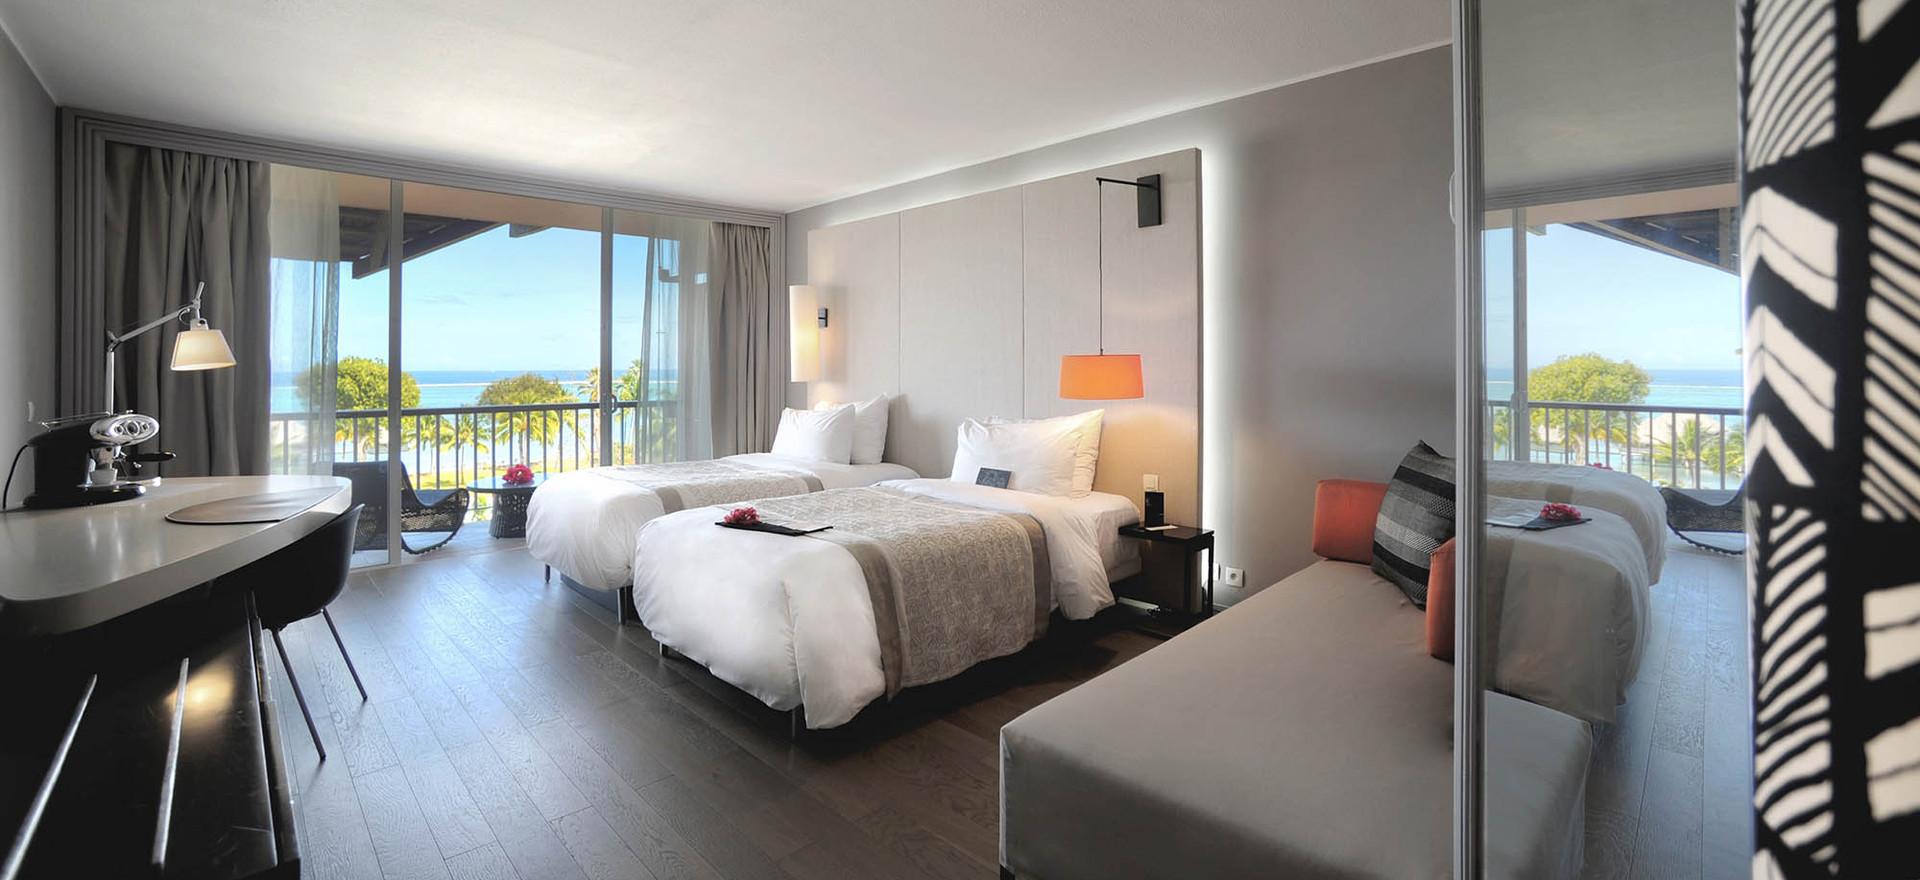 Luxury Panoramic Room